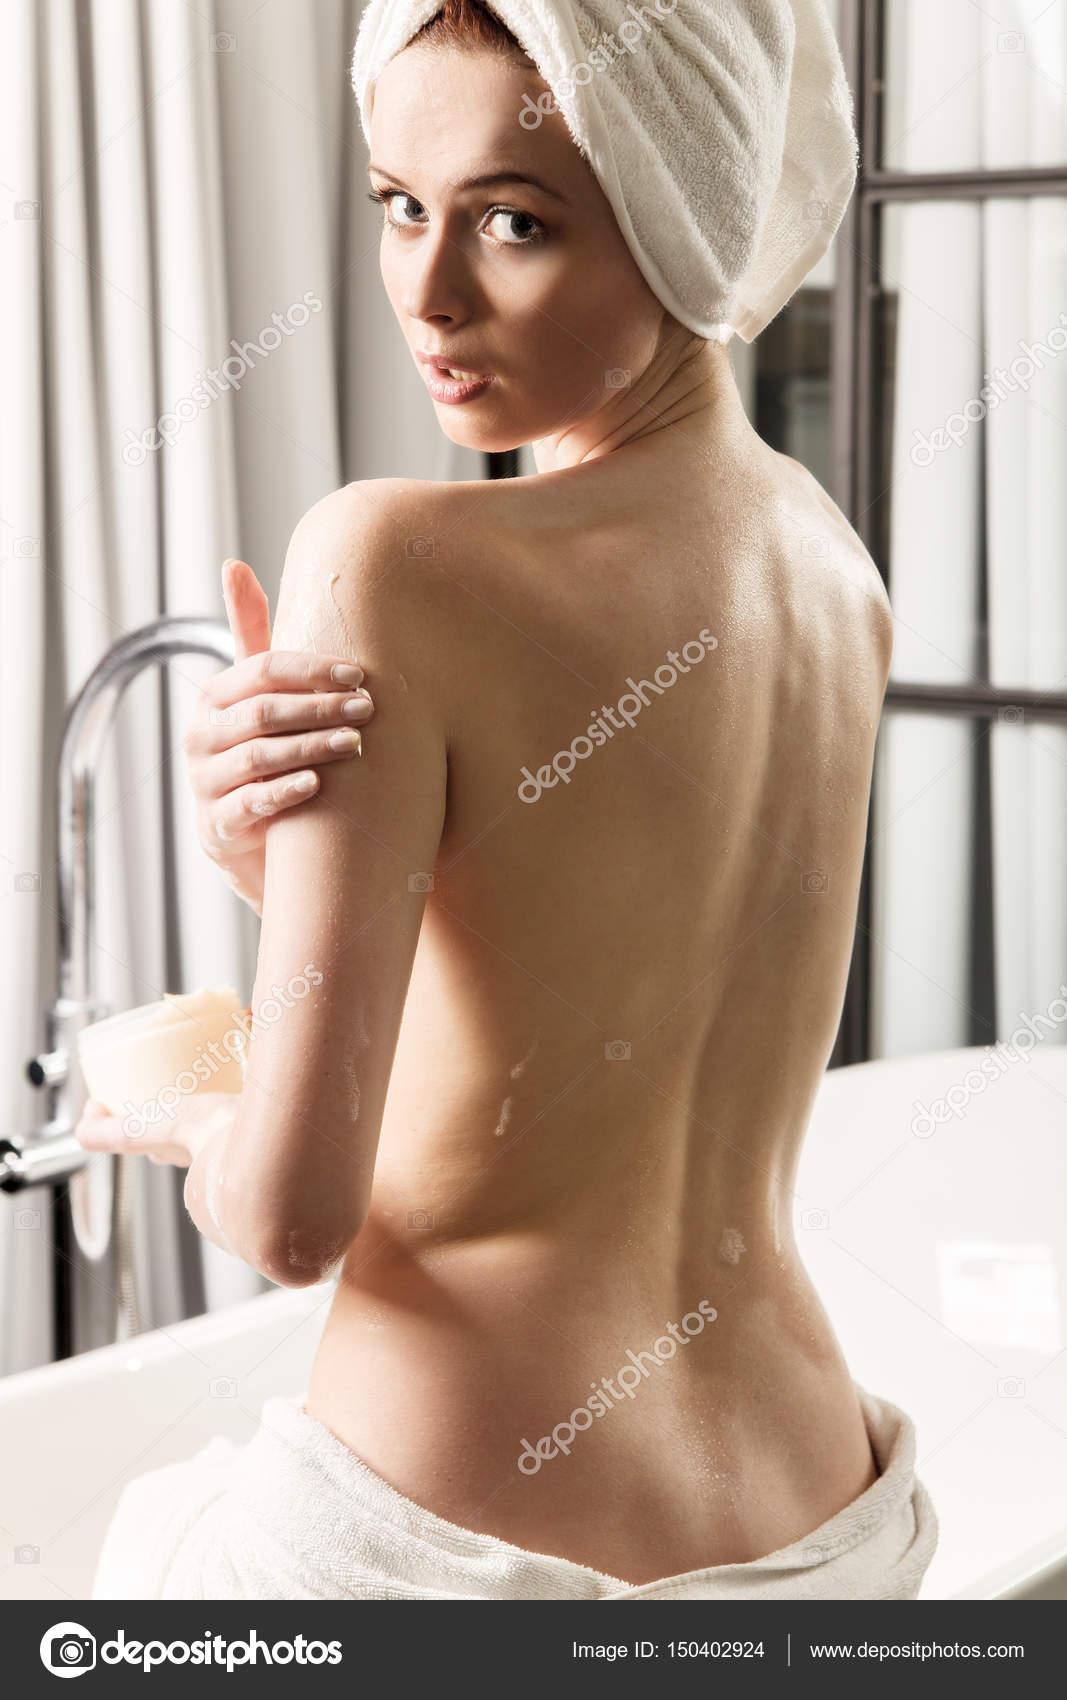 Hermosa Pelirroja Joven Desnuda Con Una Toalla Envuelta Sobre La